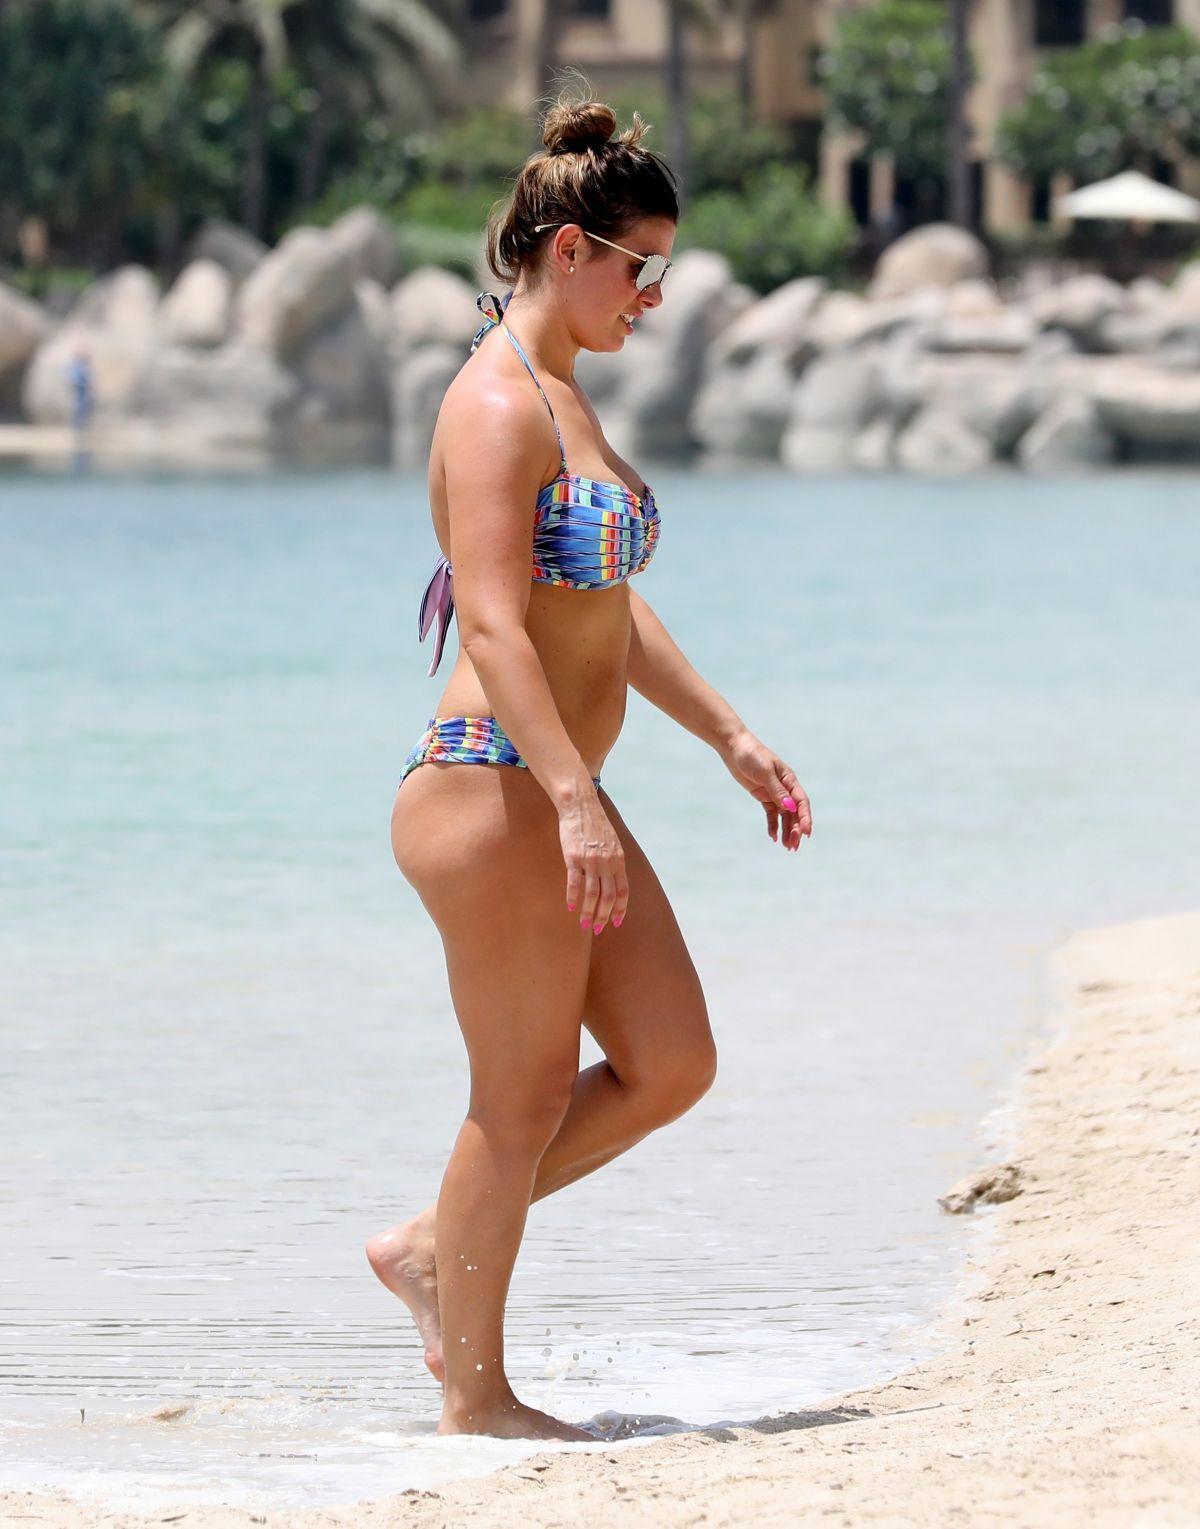 REBEKAH VARDY in Bikini on the Beach in Dubai 07/01/2017